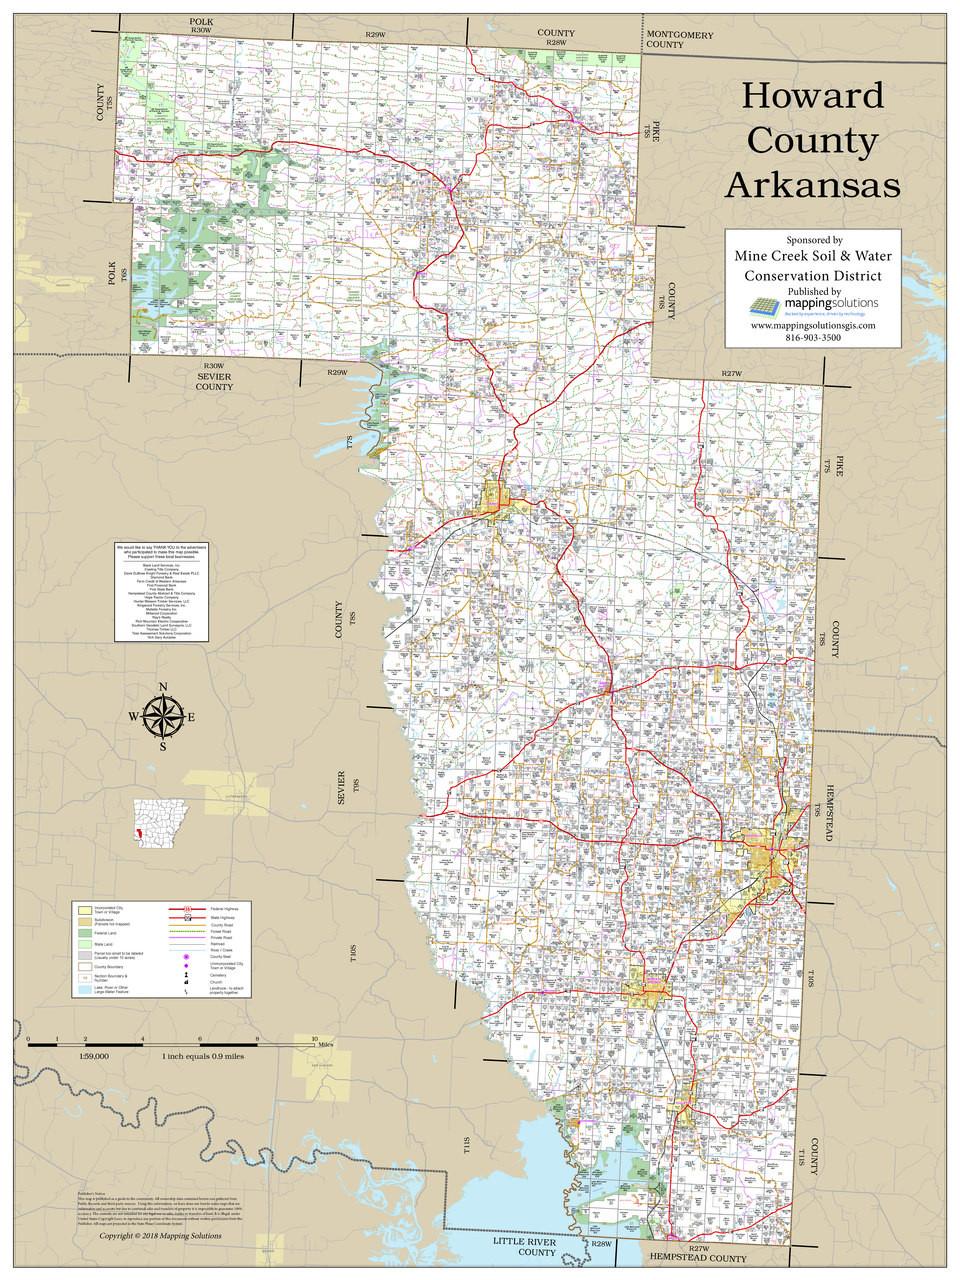 Howard County Arkansas 2018 Wall Map on map of damascus arkansas, map of washington arkansas, map of wineries in arkansas, map of arkadelphia arkansas, map of arkansas and missouri, map of malvern arkansas, map of all cities in arkansas, map of buffalo river arkansas, map of texarkana arkansas, map of texas and arkansas, map of montgomery pa, towns in polk county arkansas, map of washington county il, maps of creeks in arkansas, map of rogers arkansas, map of east end arkansas, map of mount ida arkansas, map of perryville arkansas, map of oak grove arkansas, detailed map of arkansas,